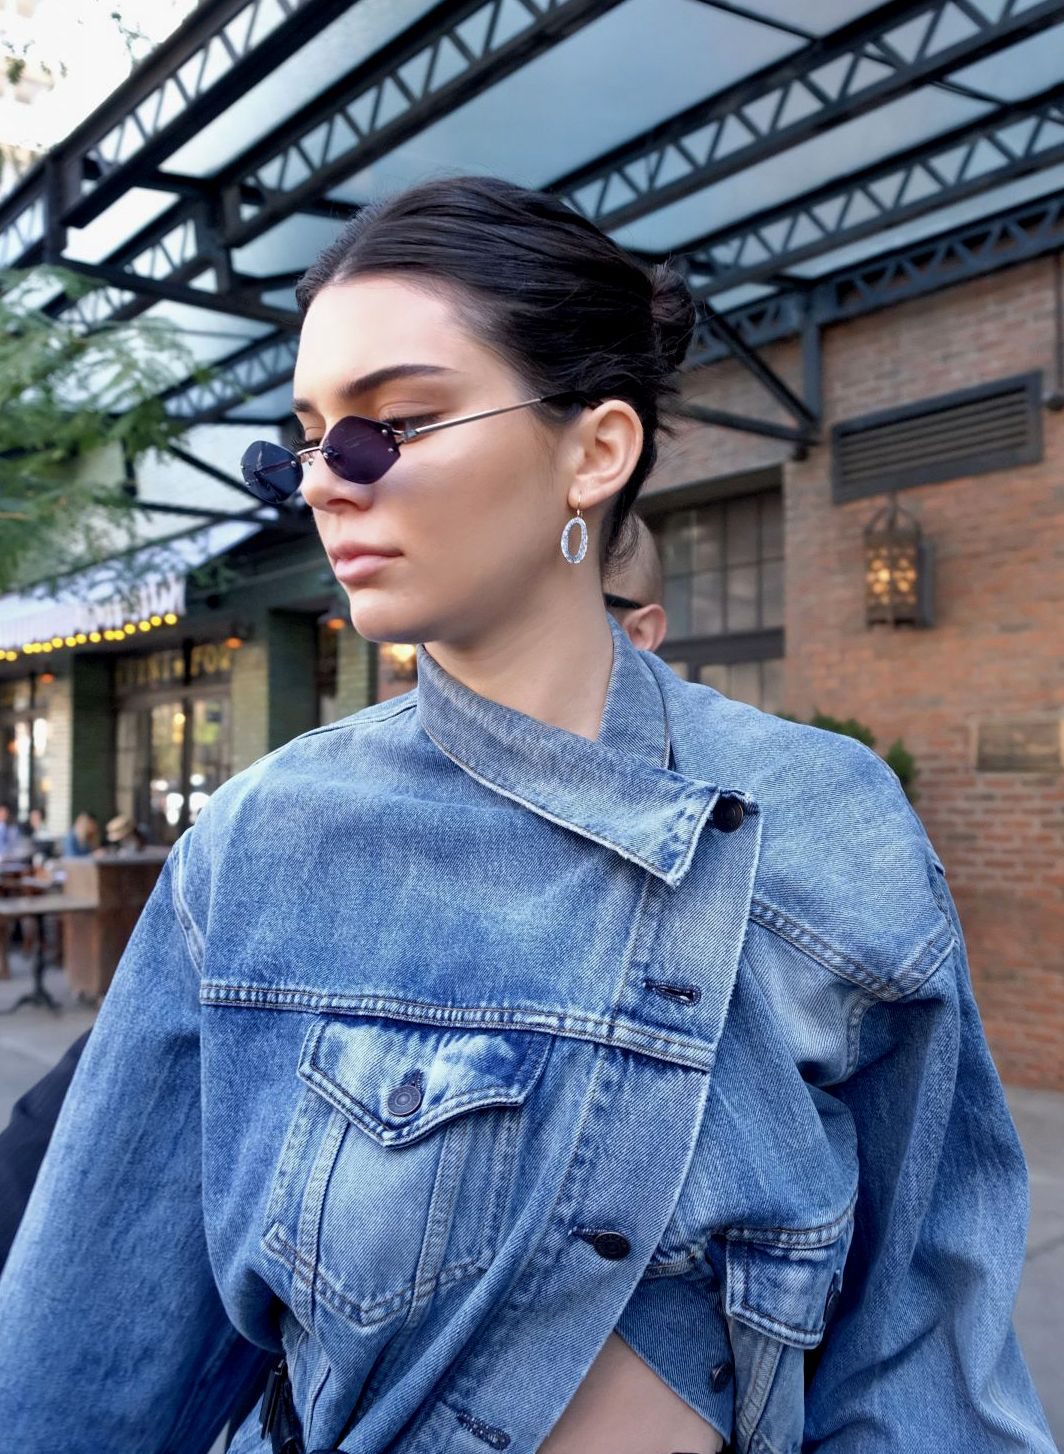 Kendall Jenner Wearing IPPOLITA Sapphire Cherish Earrings For NYFW